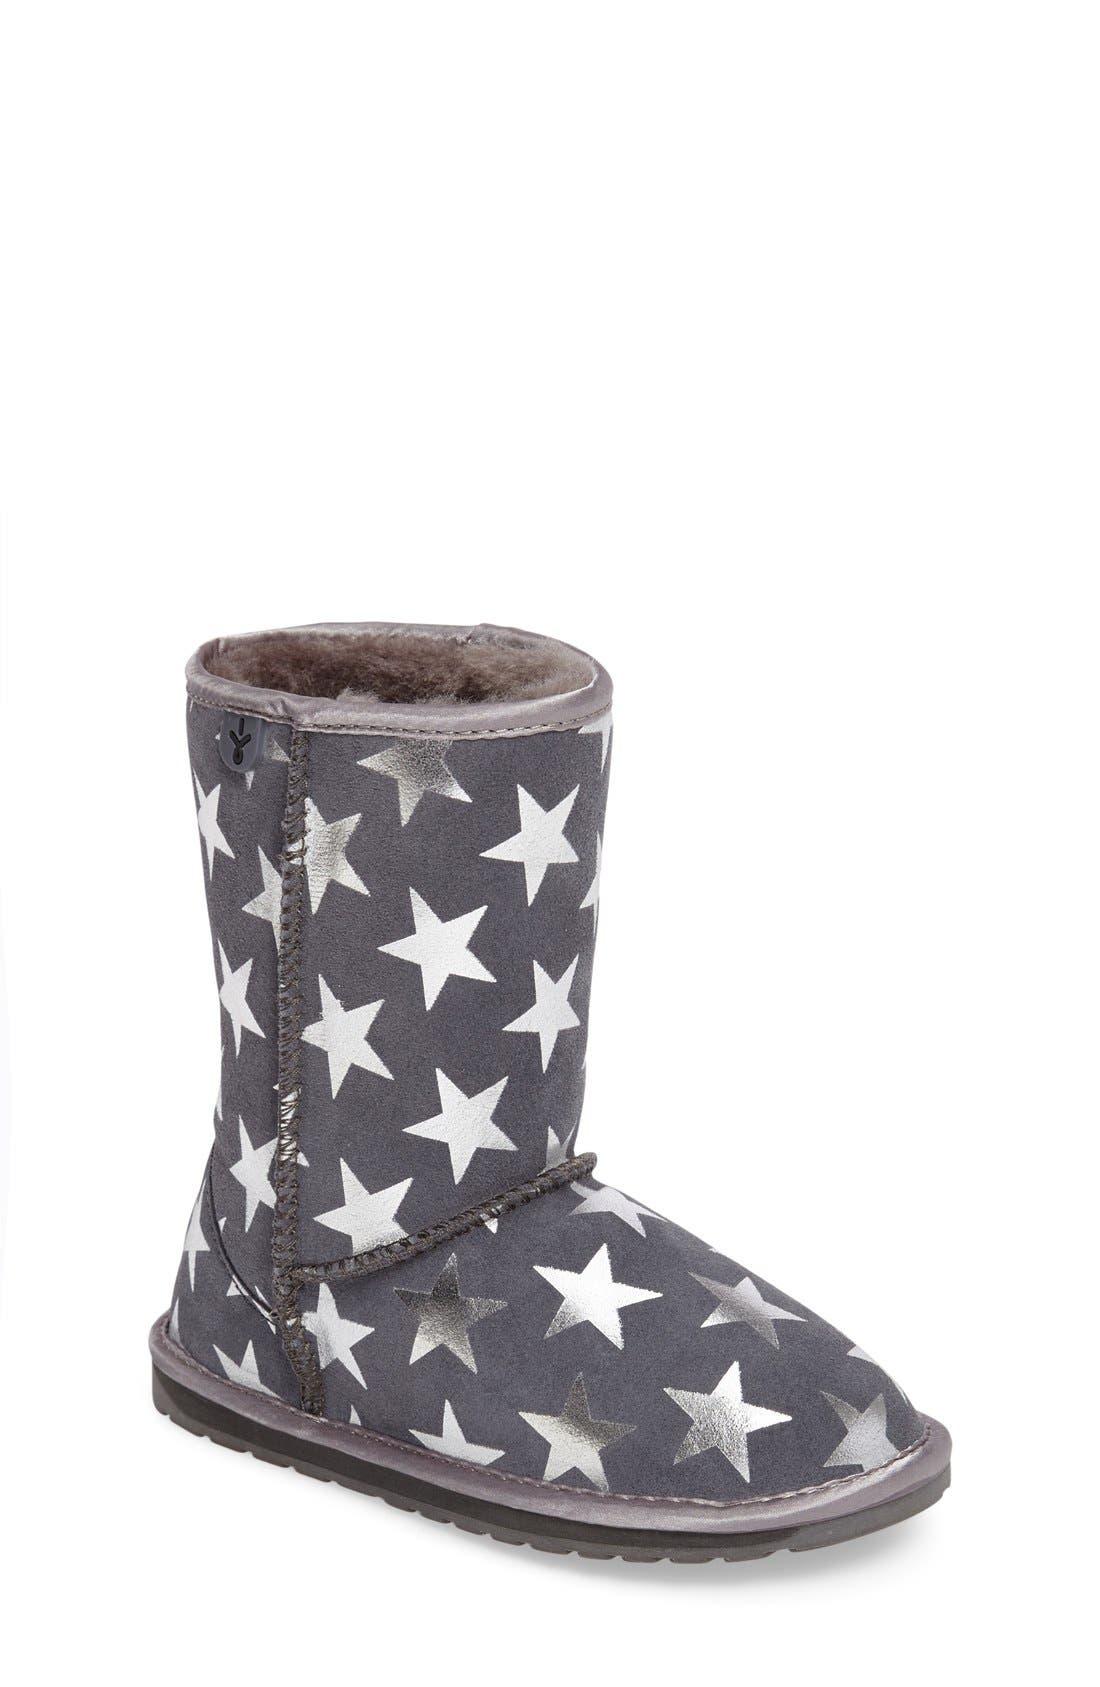 Alternate Image 1 Selected - EMUAustralia 'Starry Night' Boot (Toddler, Little Kid & Big Kid)